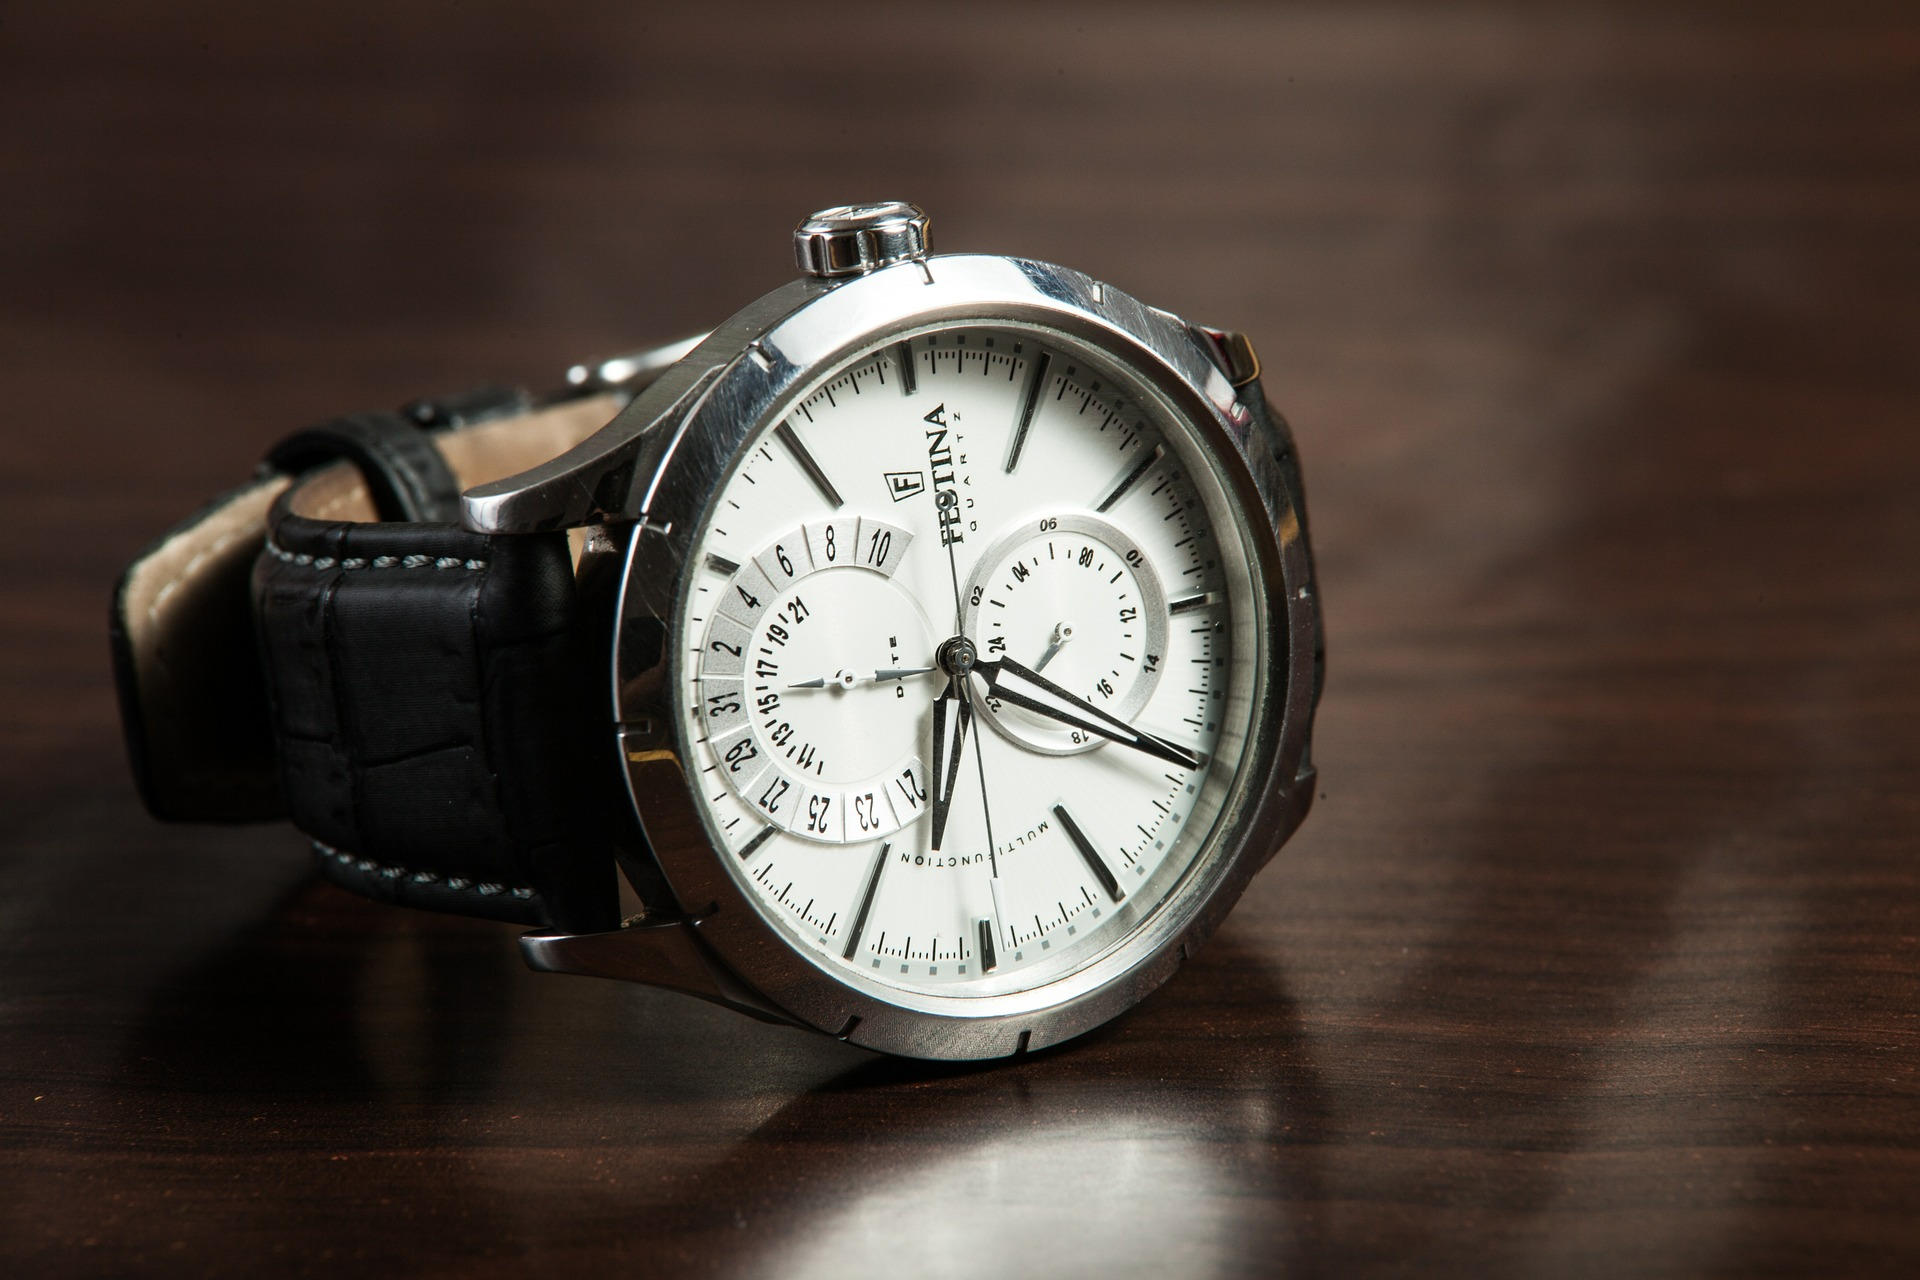 watch repair services